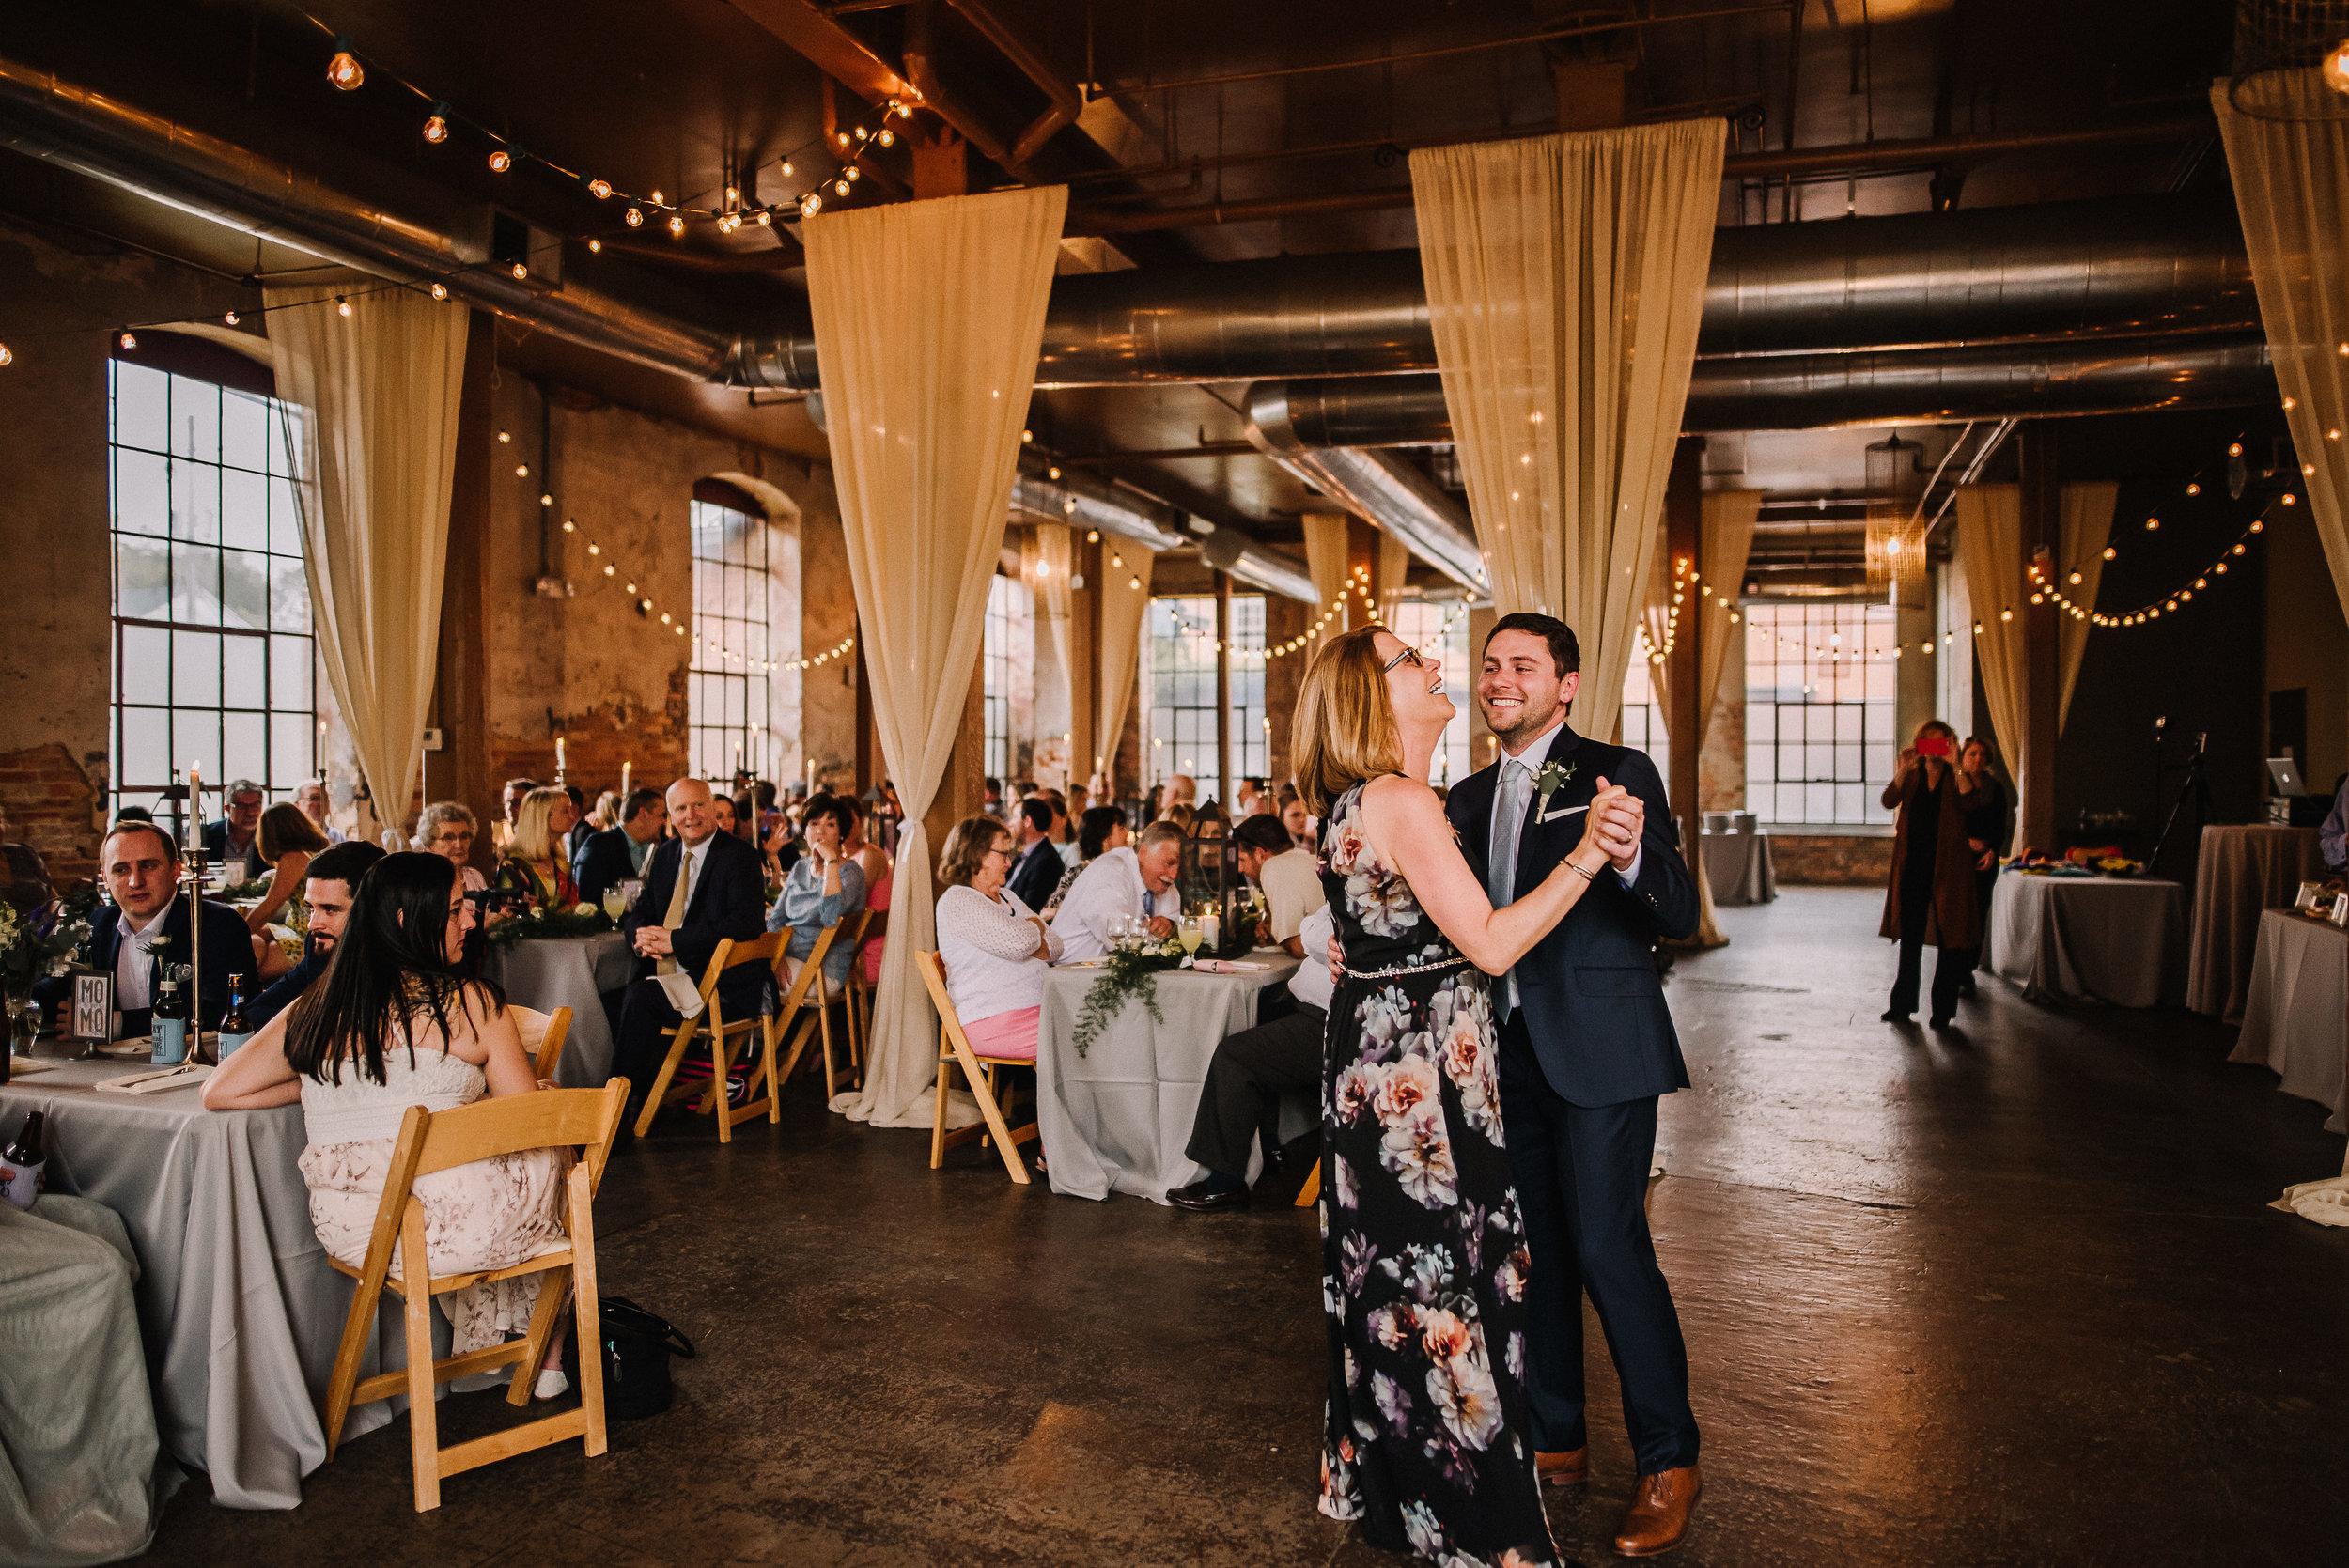 Morgan Wedding_Mill at Yellow River_Ashley Benham Photography-1024.jpg